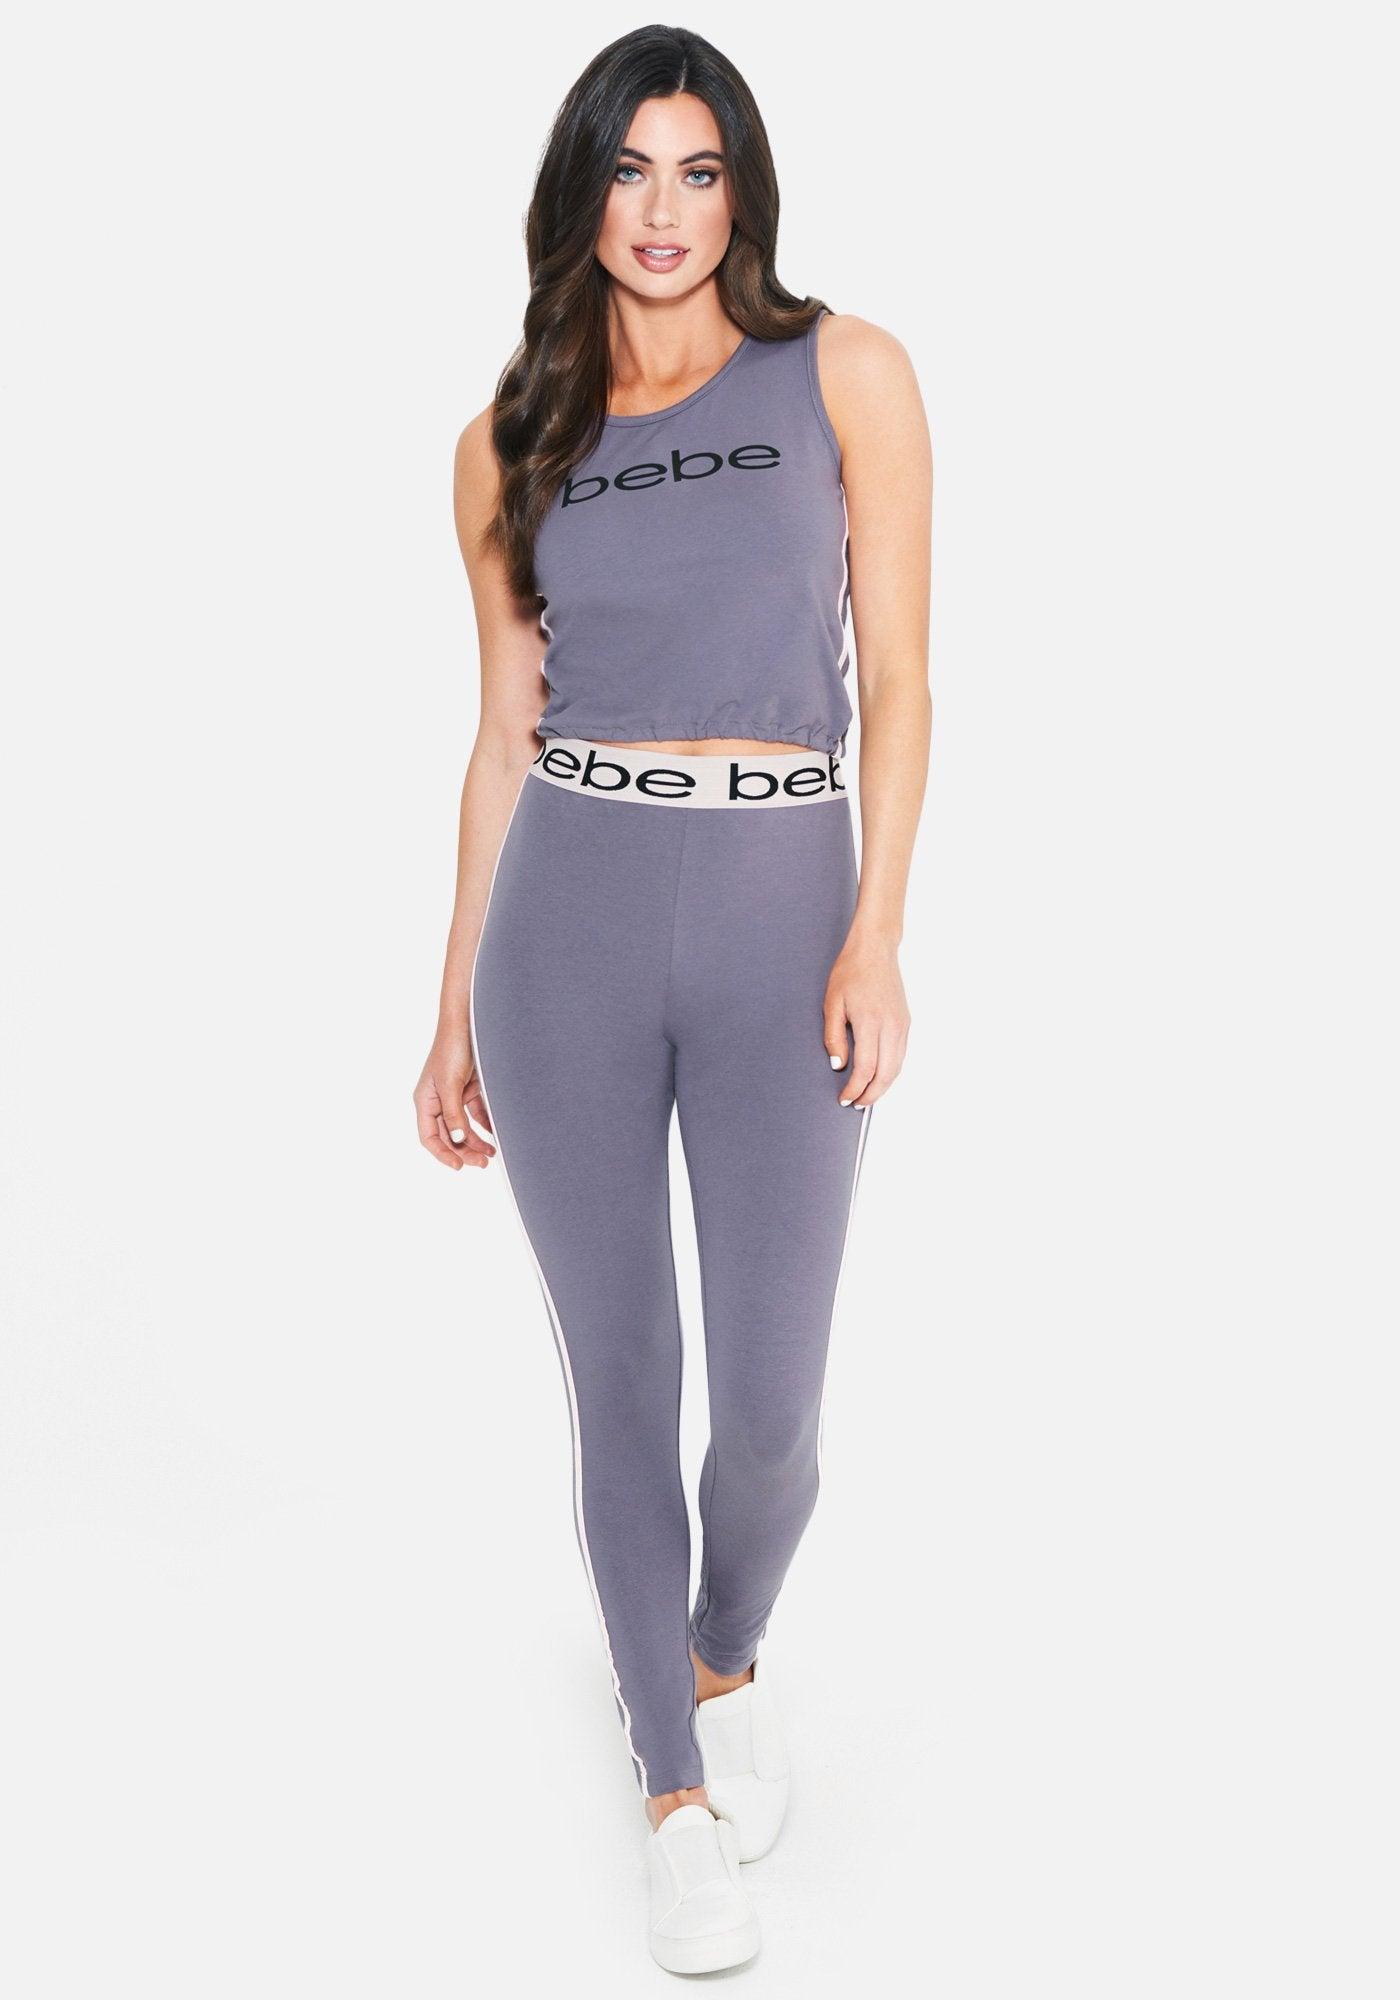 bebe Women's Bebe Logo Crop Tee Shirt Pant Set, Size XL in Midnight Lavendar Cotton/Spandex